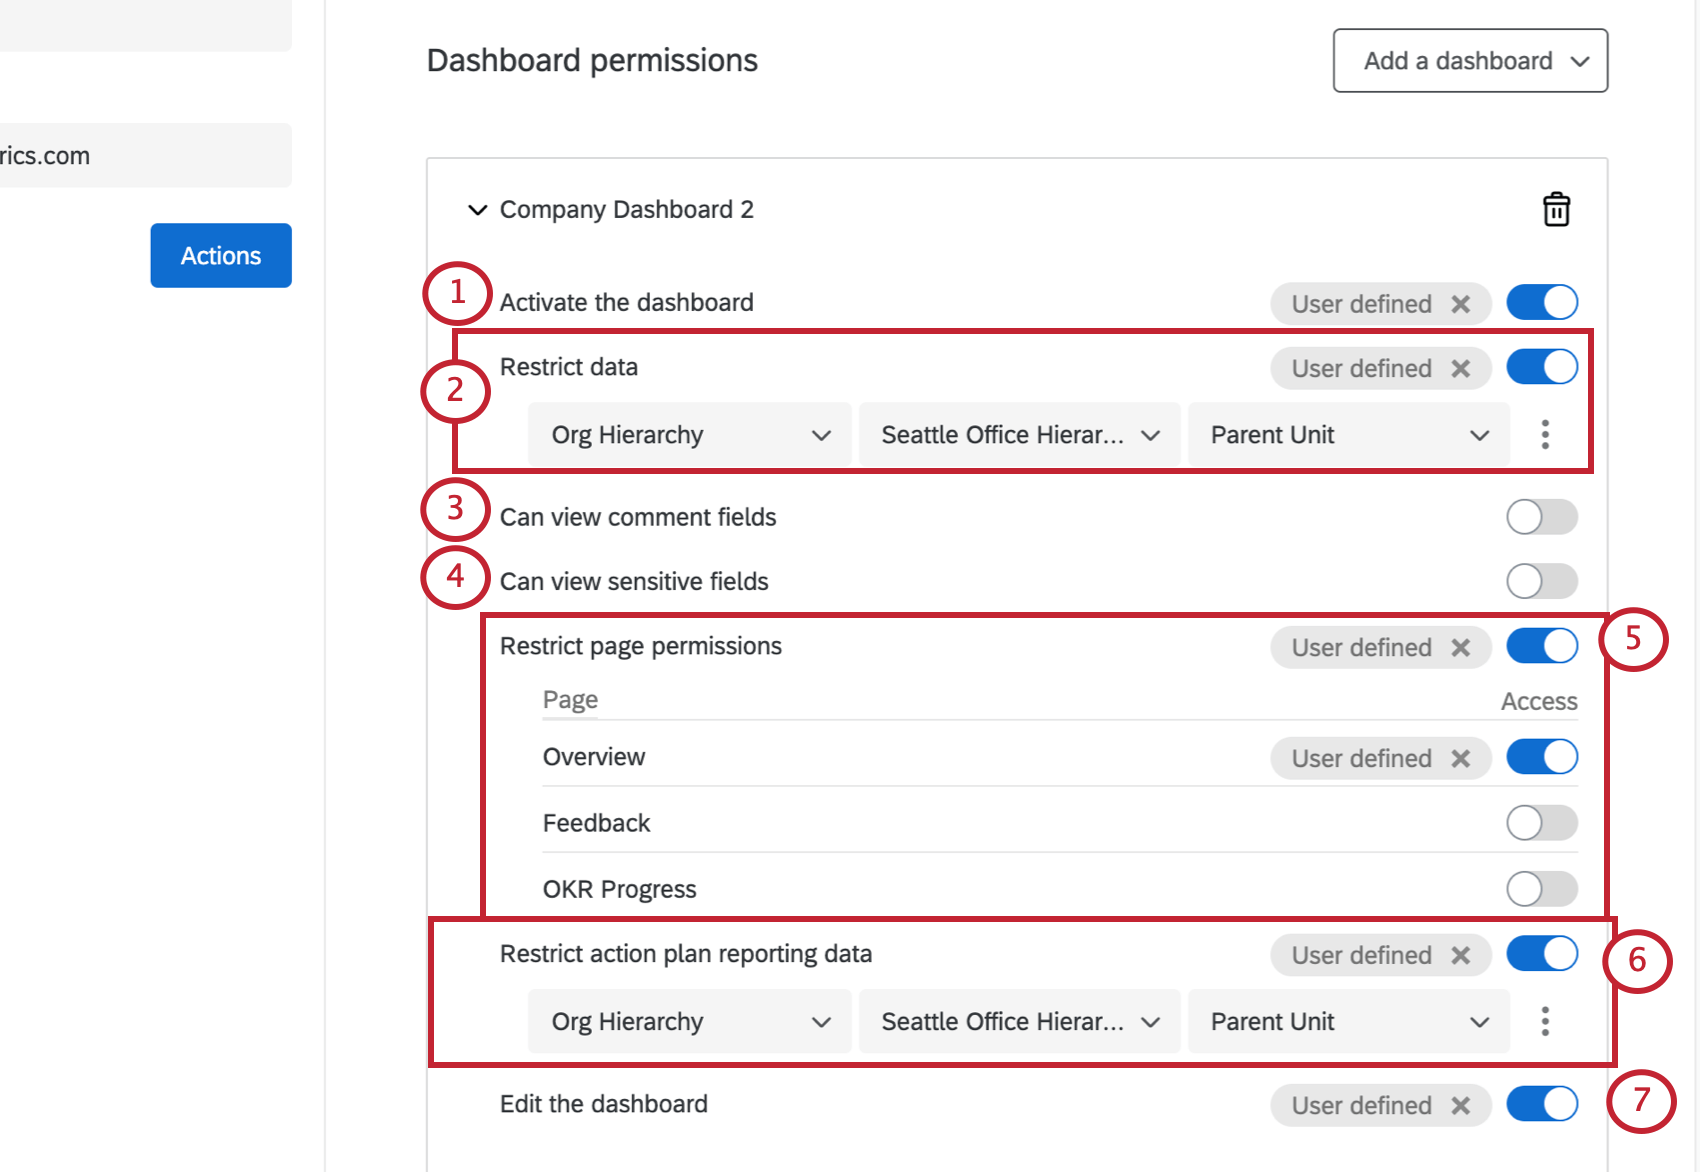 Dashboard-specific permissions